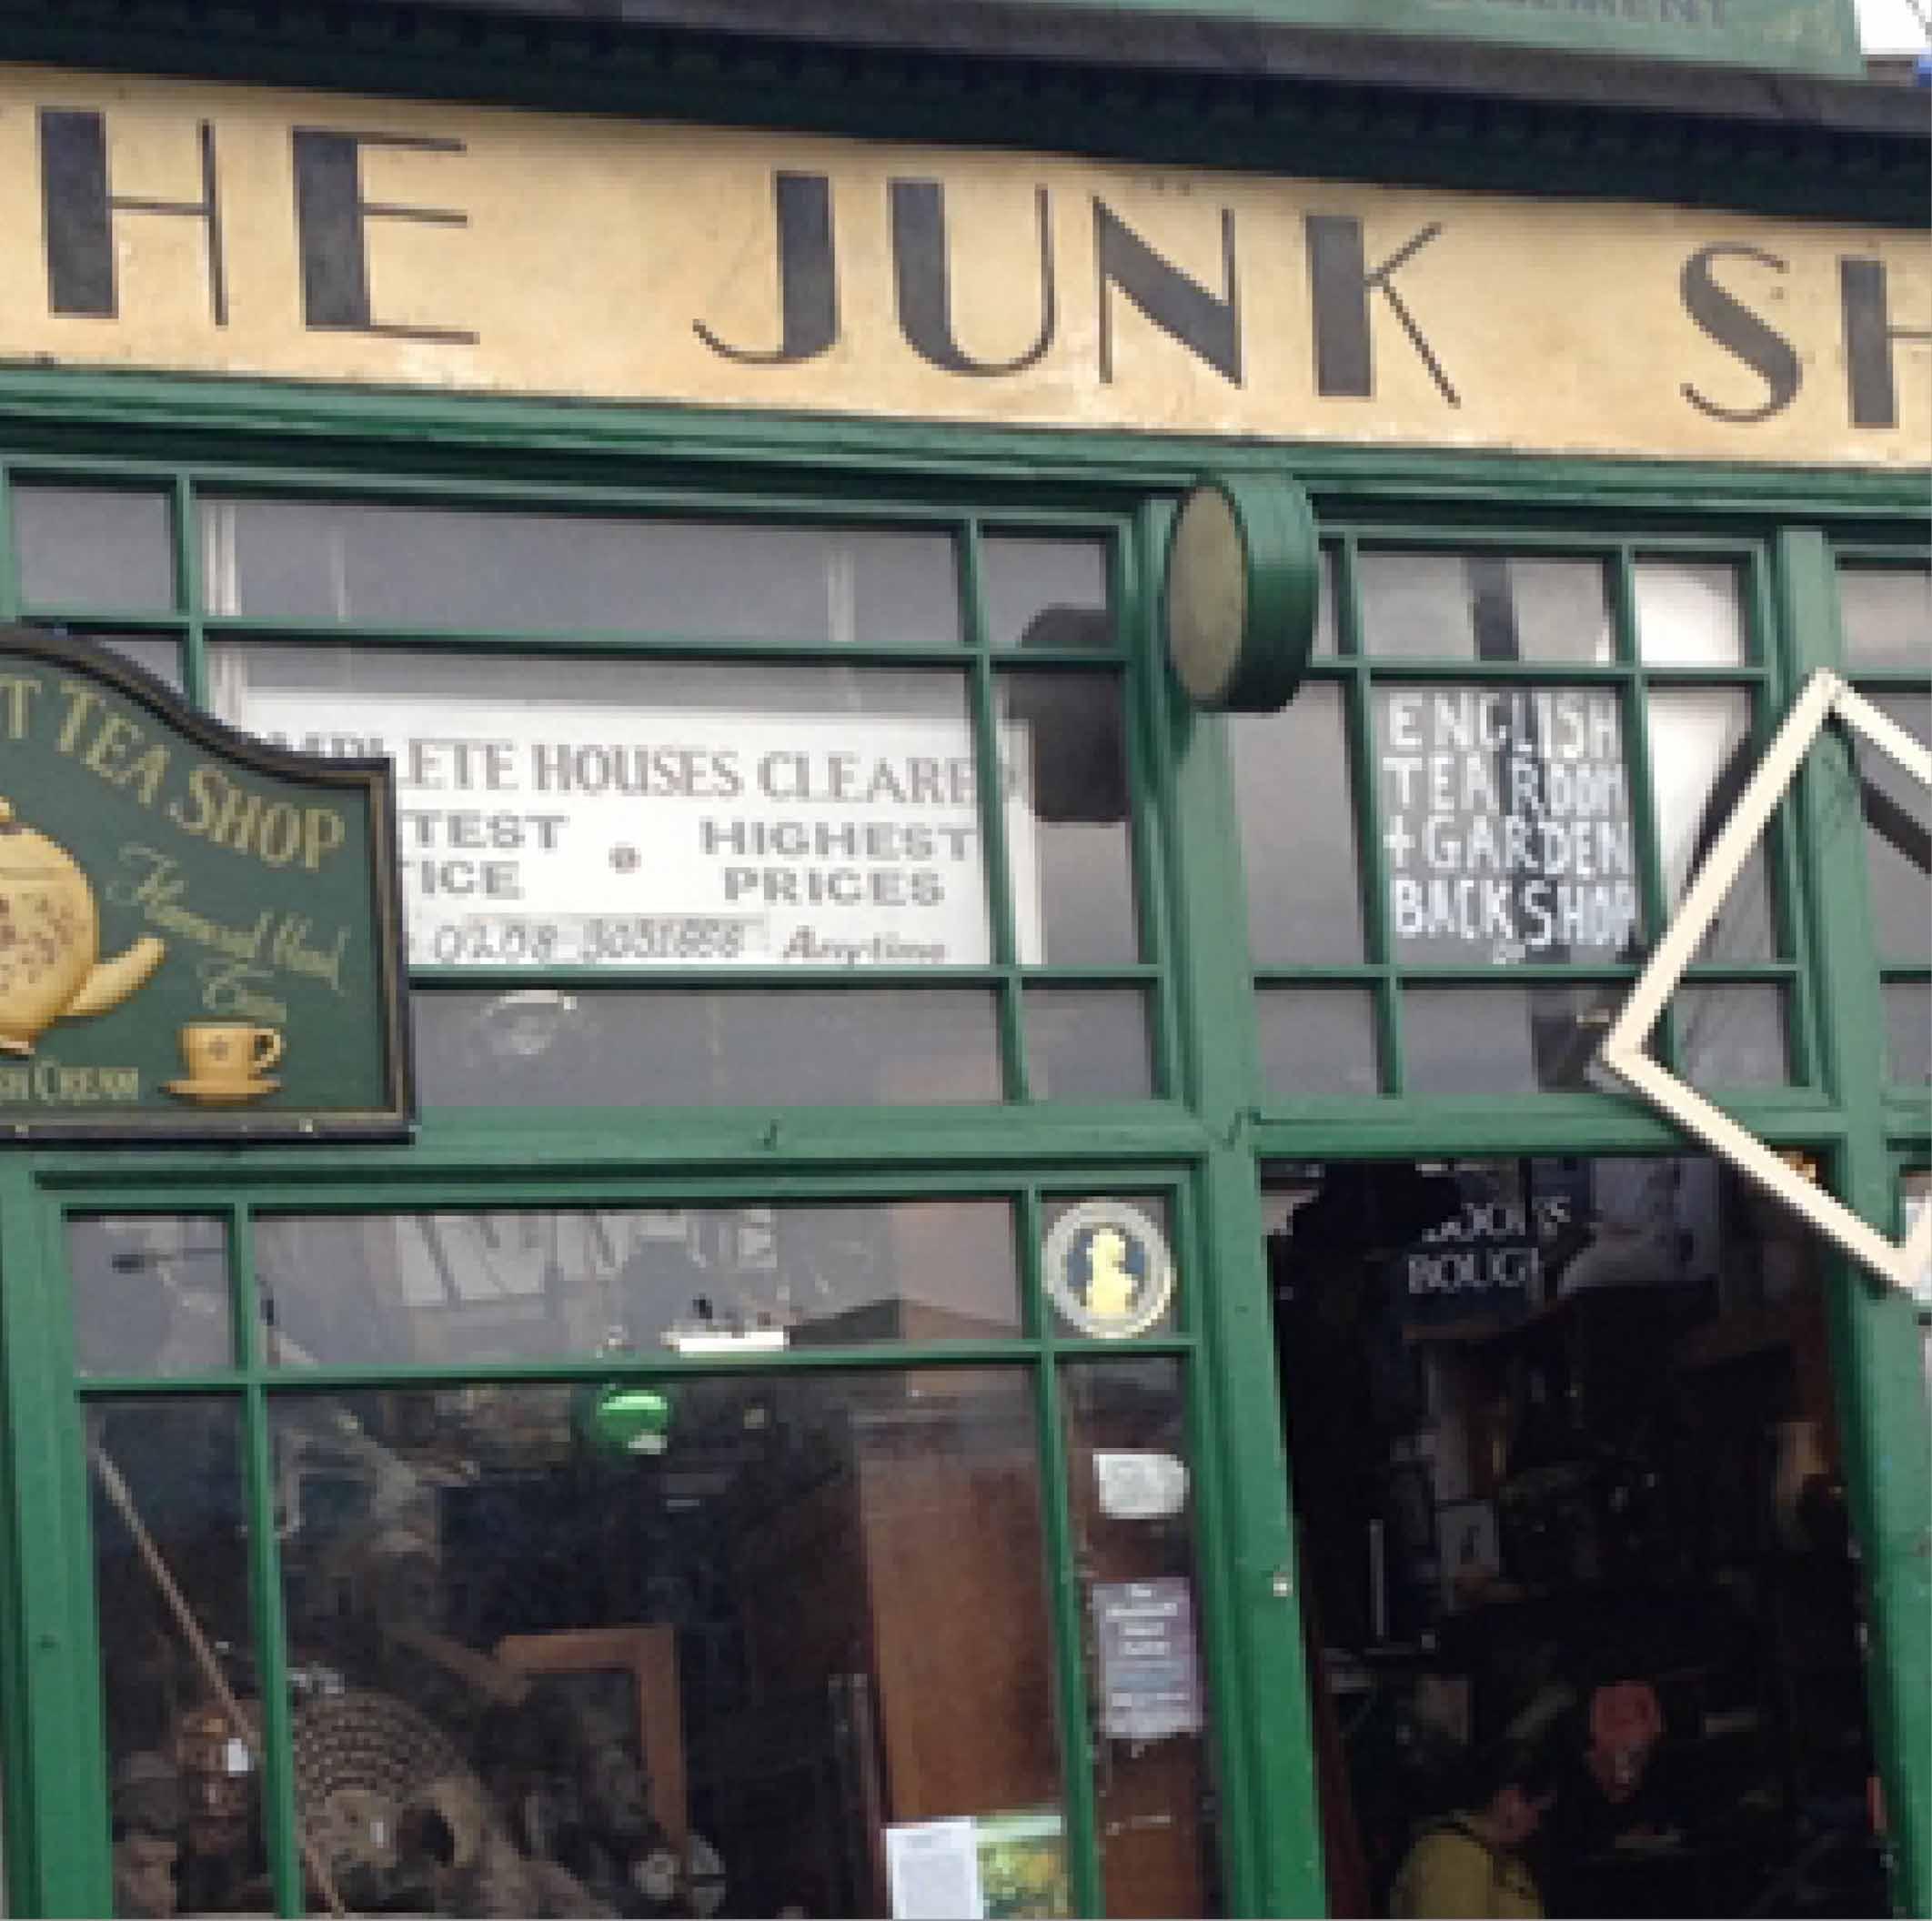 Junk Shop & Spreadeagle Antiques shop.